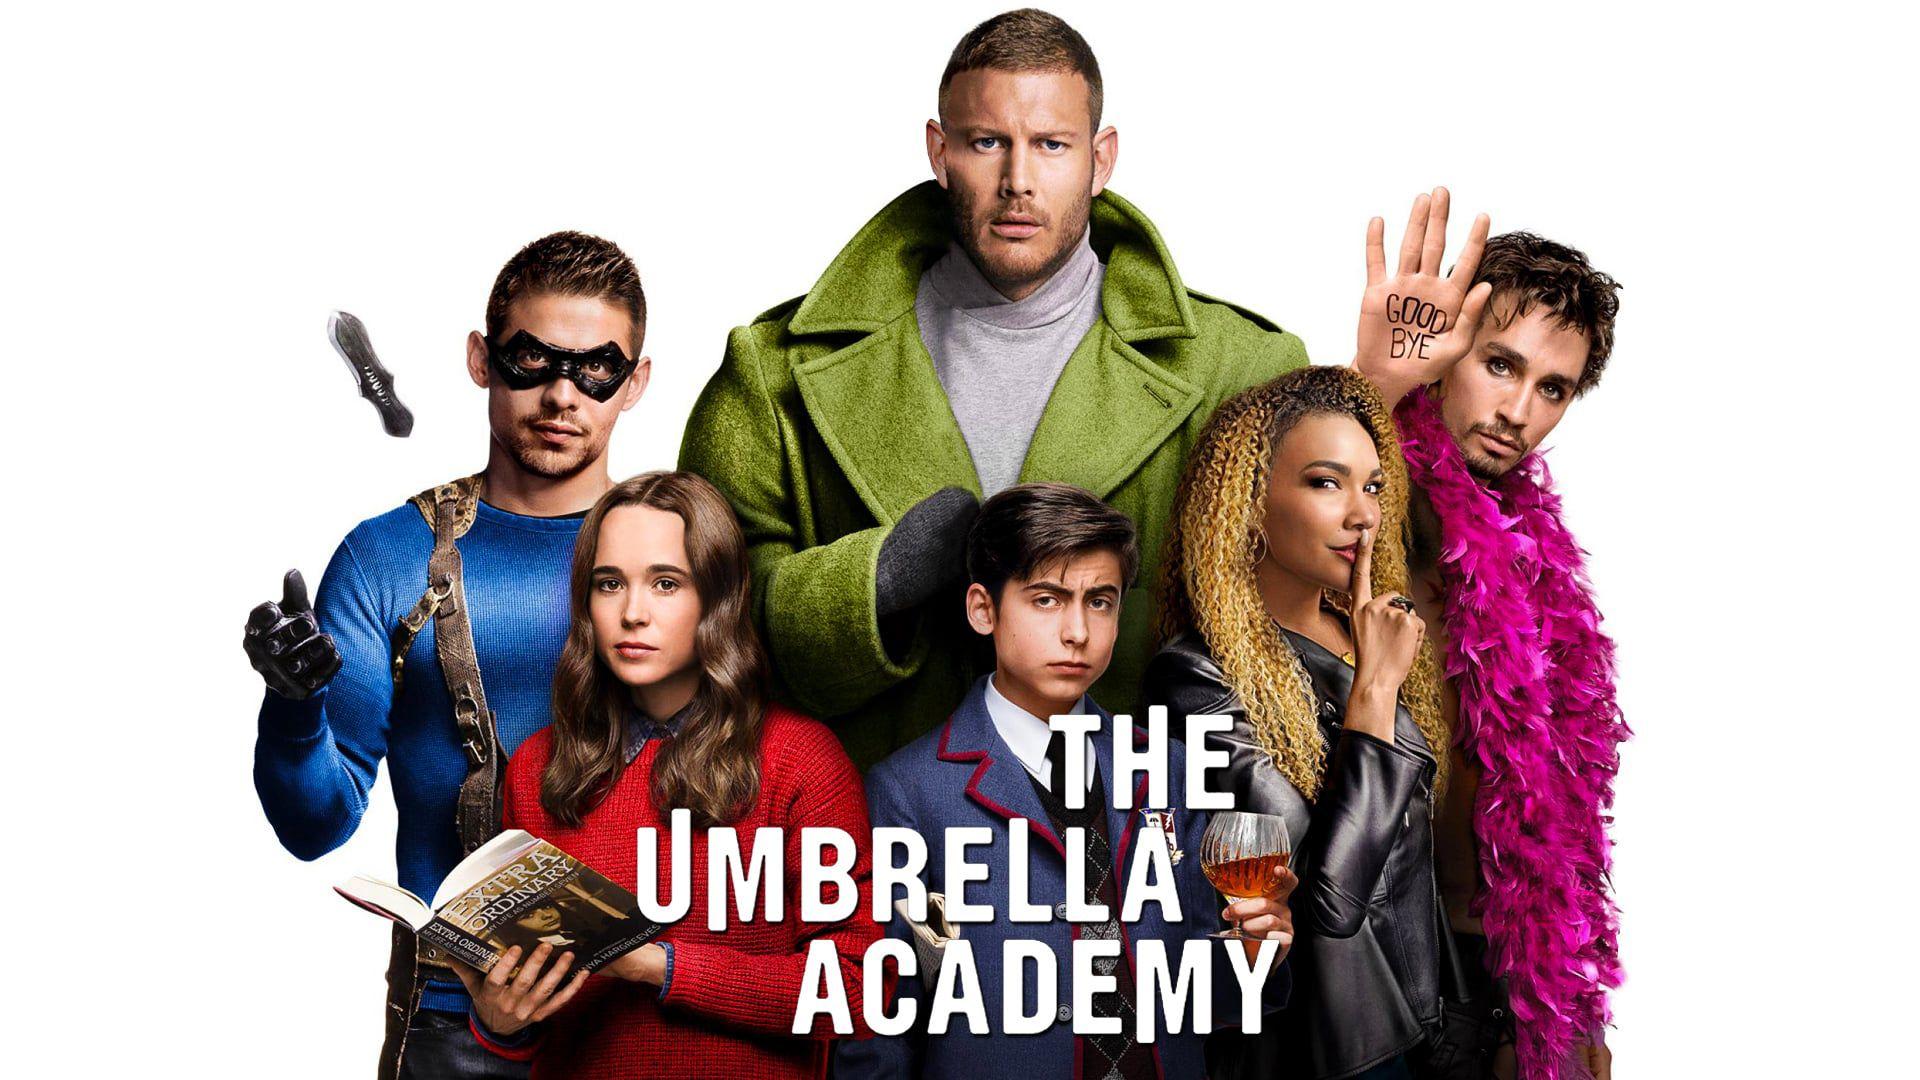 The Umbrella academy (Netflix) 645cc78889eef217bd0b3acdc332b499